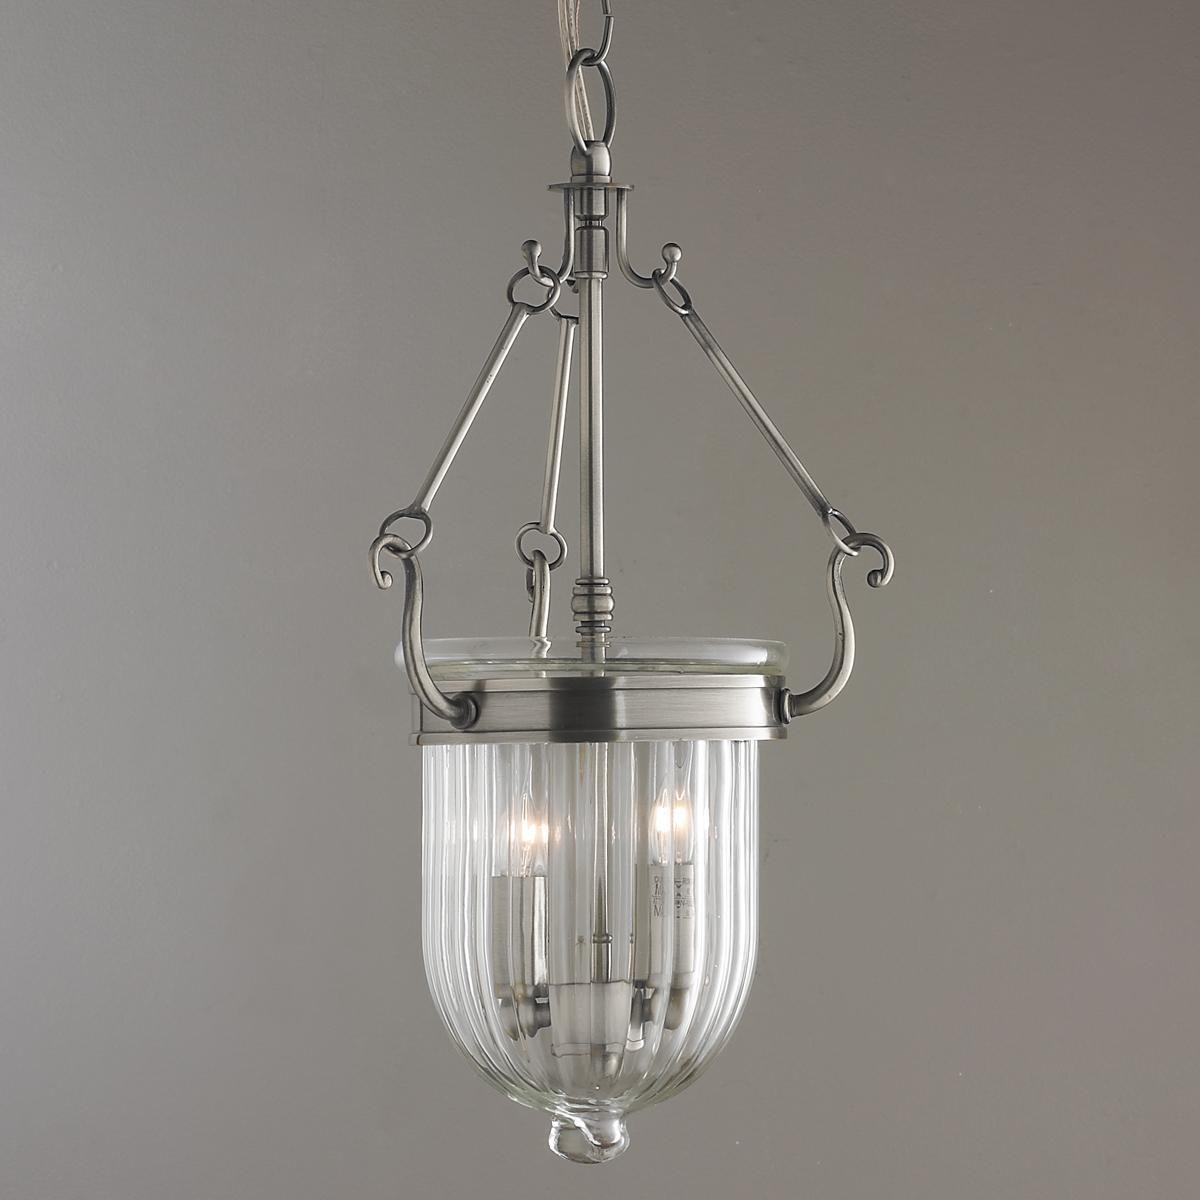 Colonial Bell Shaped Classic Hanging Lantern Glass Globe Pendant